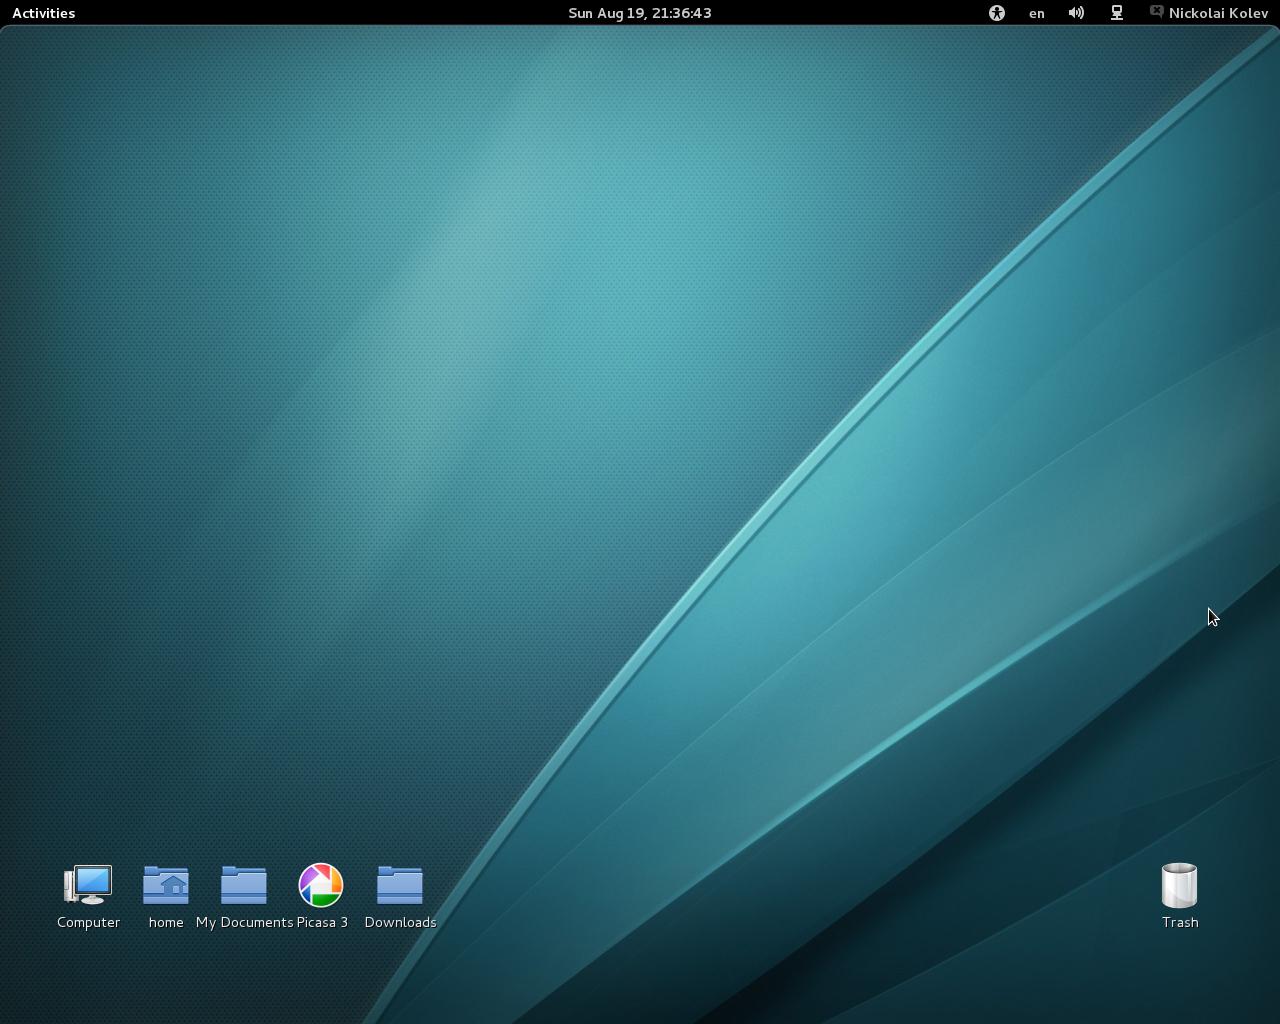 Pimped out my Fedora and Ubuntu desktops | Nickolai Kolev's Web Journal